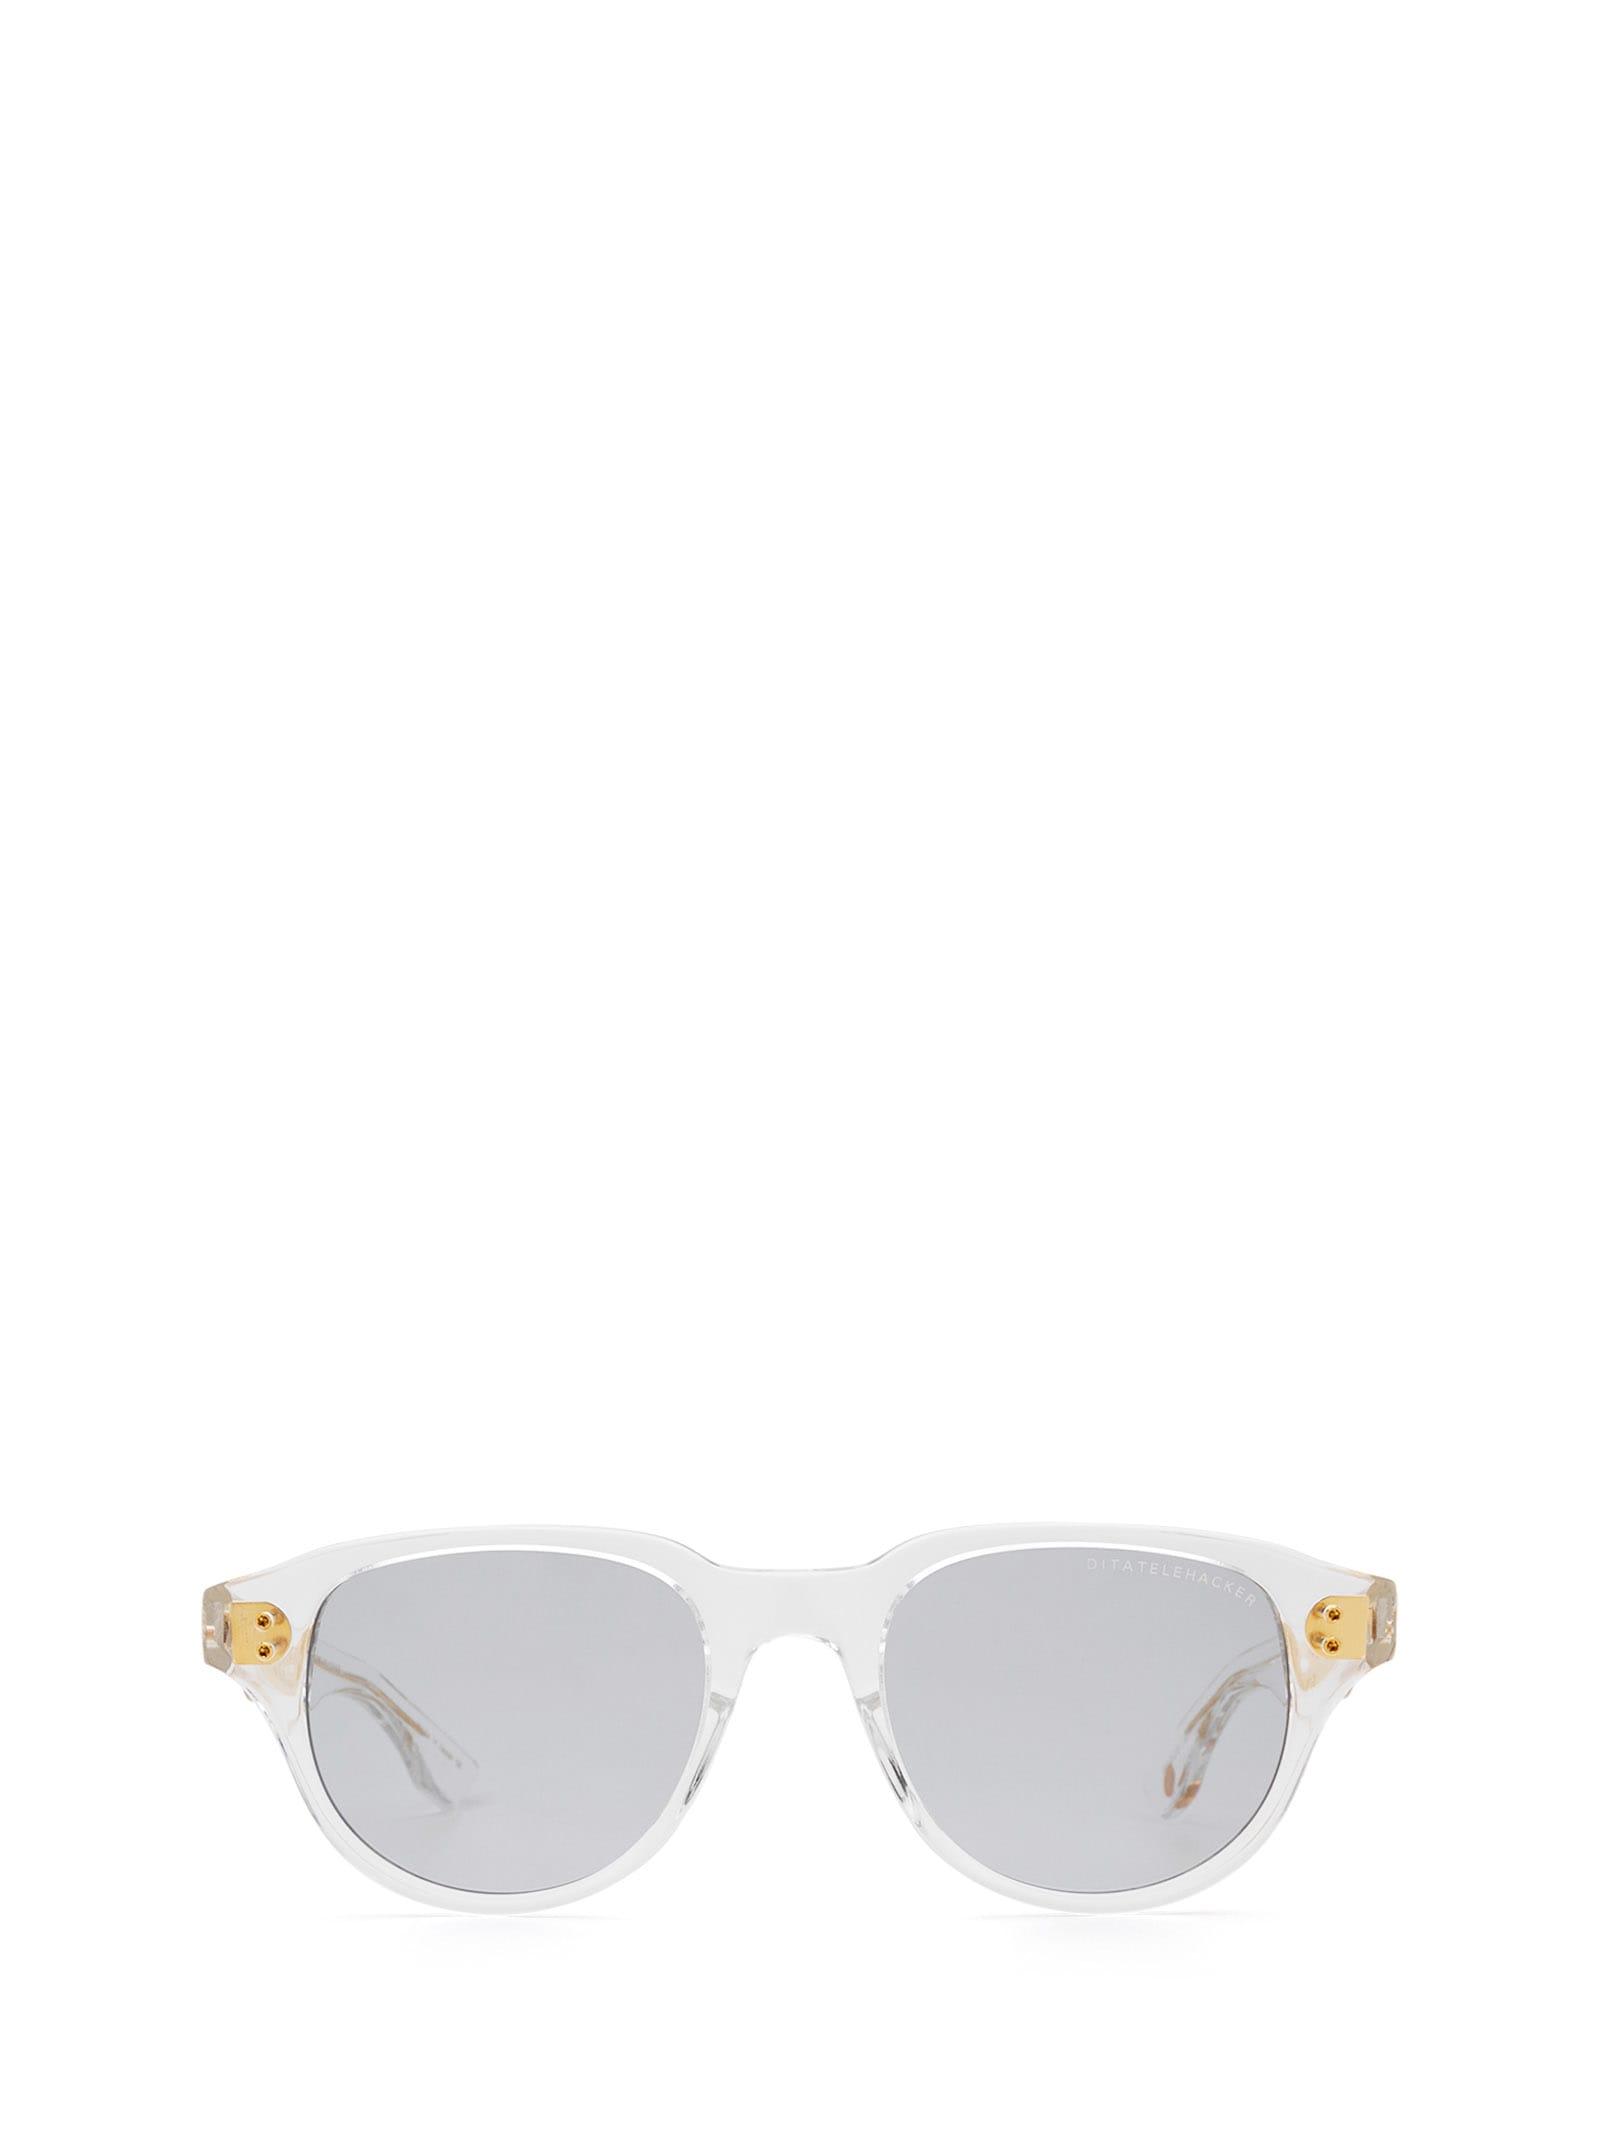 Dita Dita Dts708-a-03 Crystal Gold Sunglasses